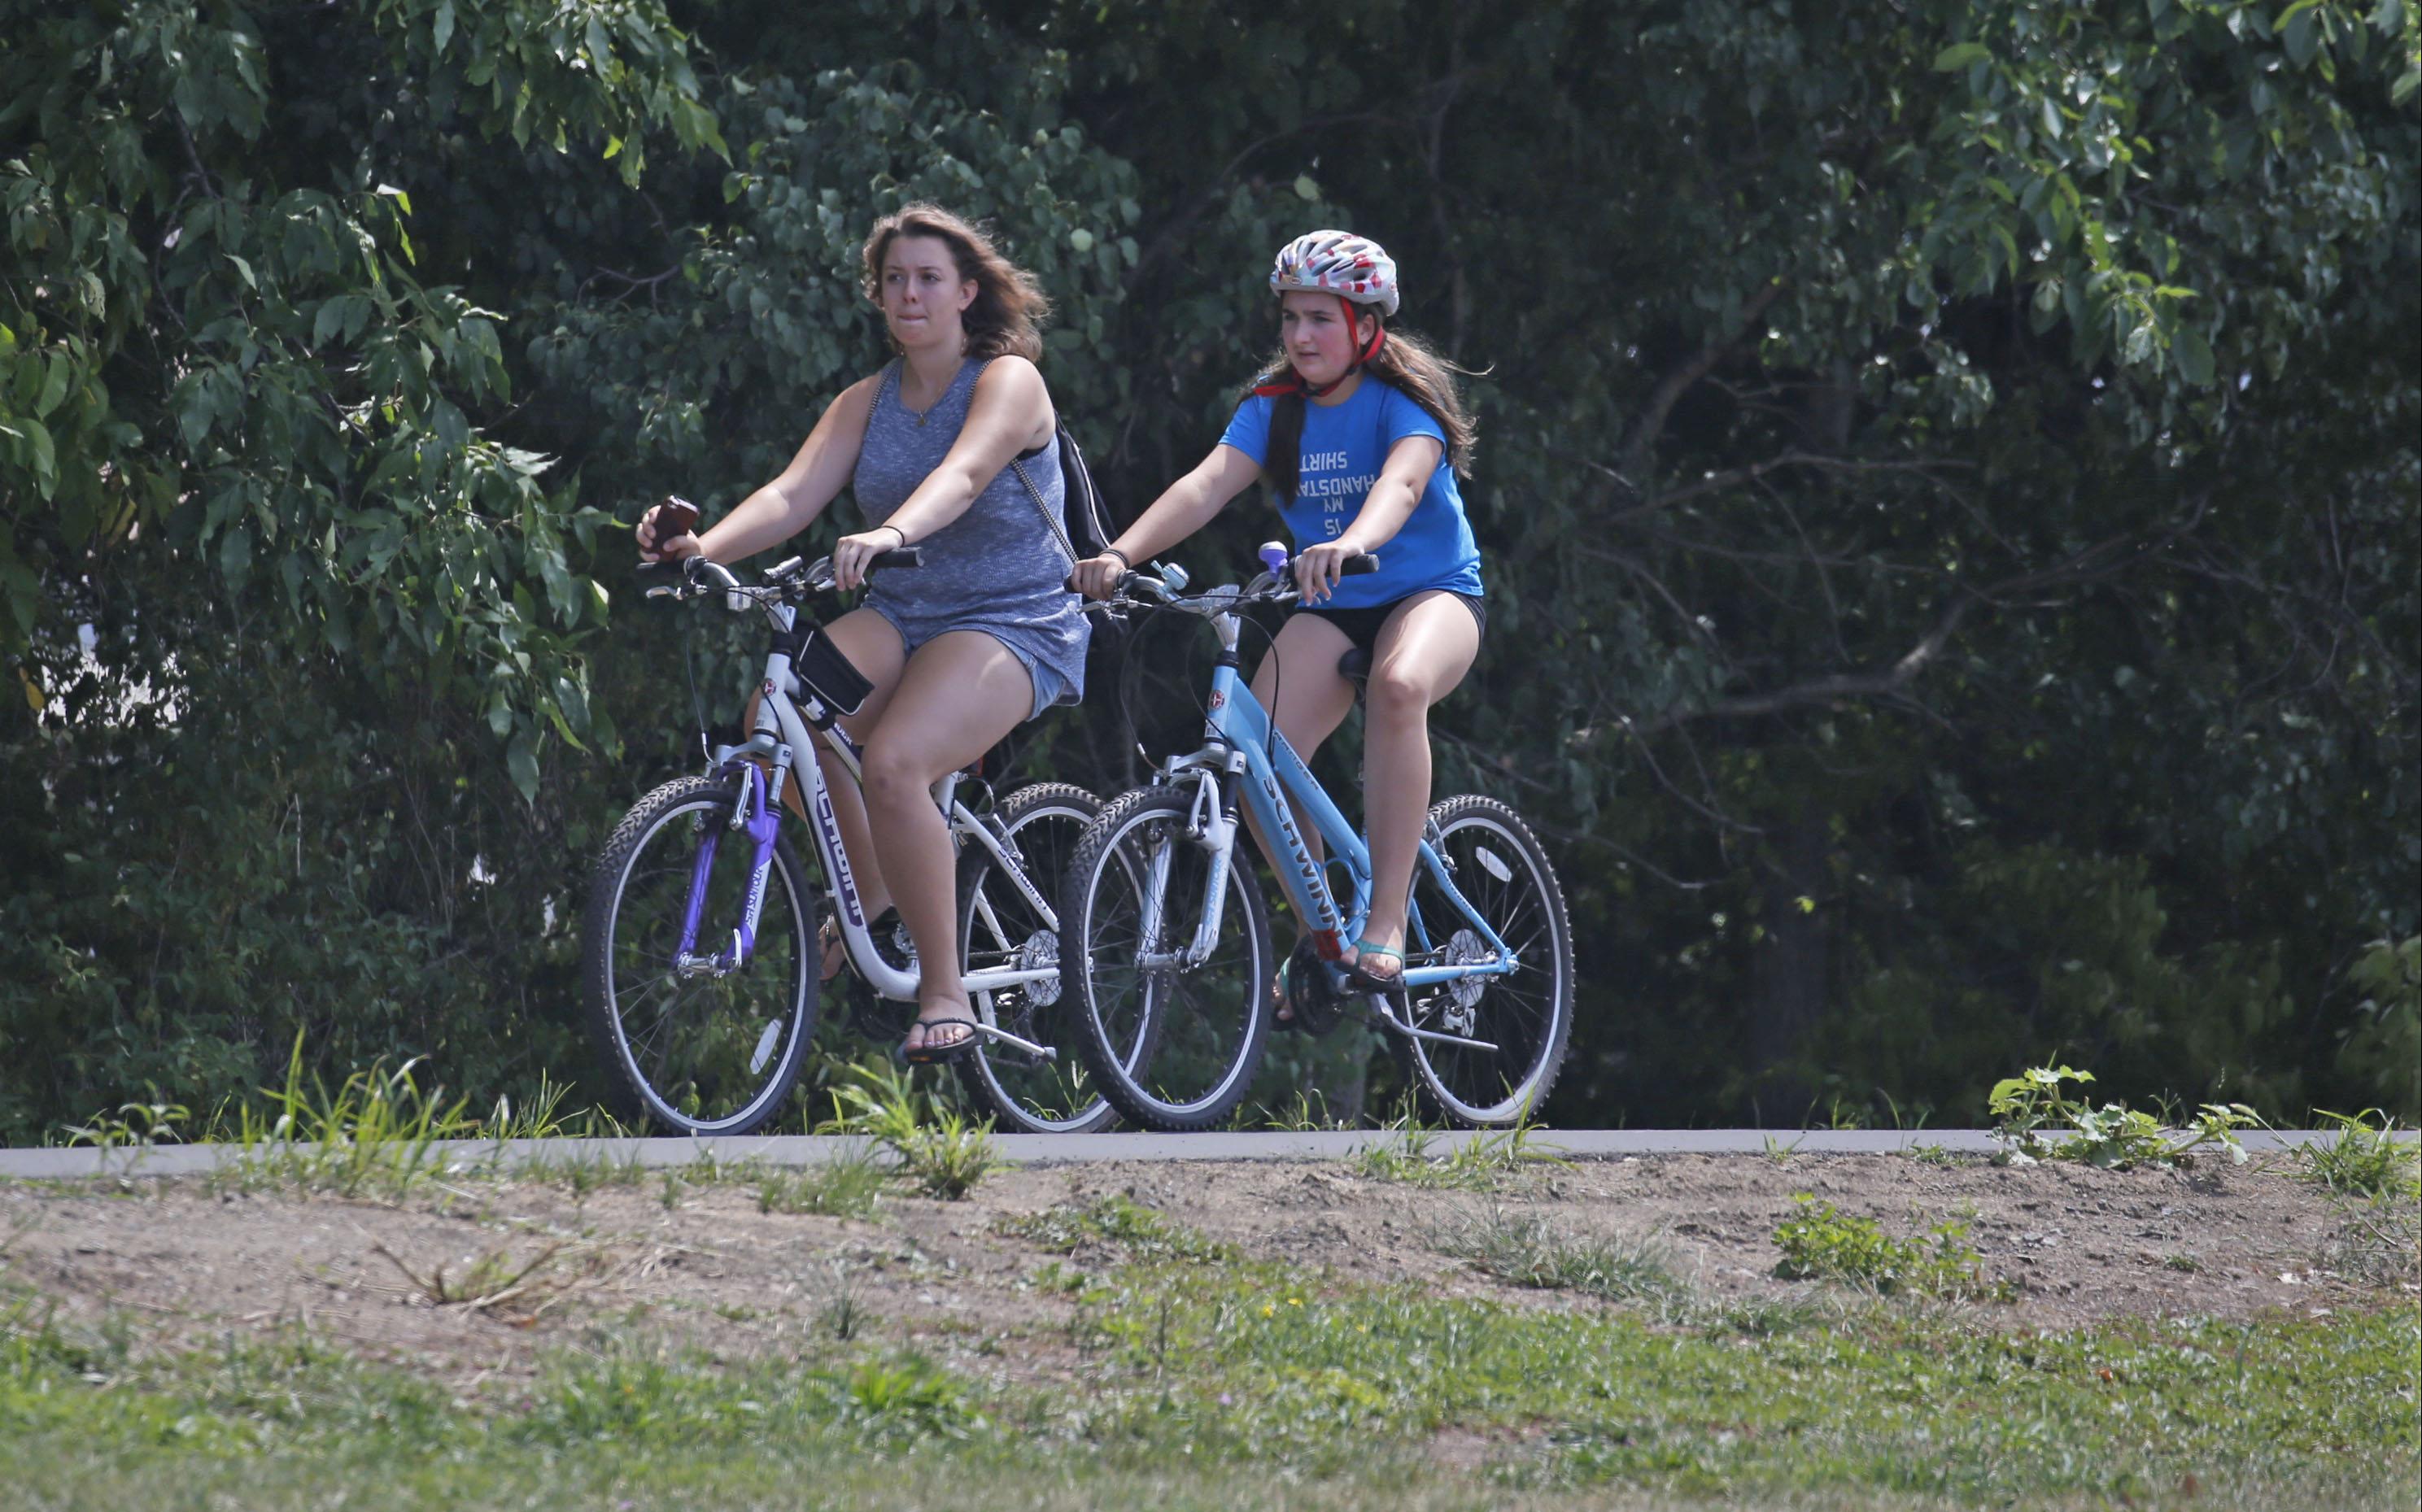 Some young bicyclists on the Tonawanda Rails to Trails section on Thursday, Aug. 11, 2016. (Robert Kirkham/Buffalo News)